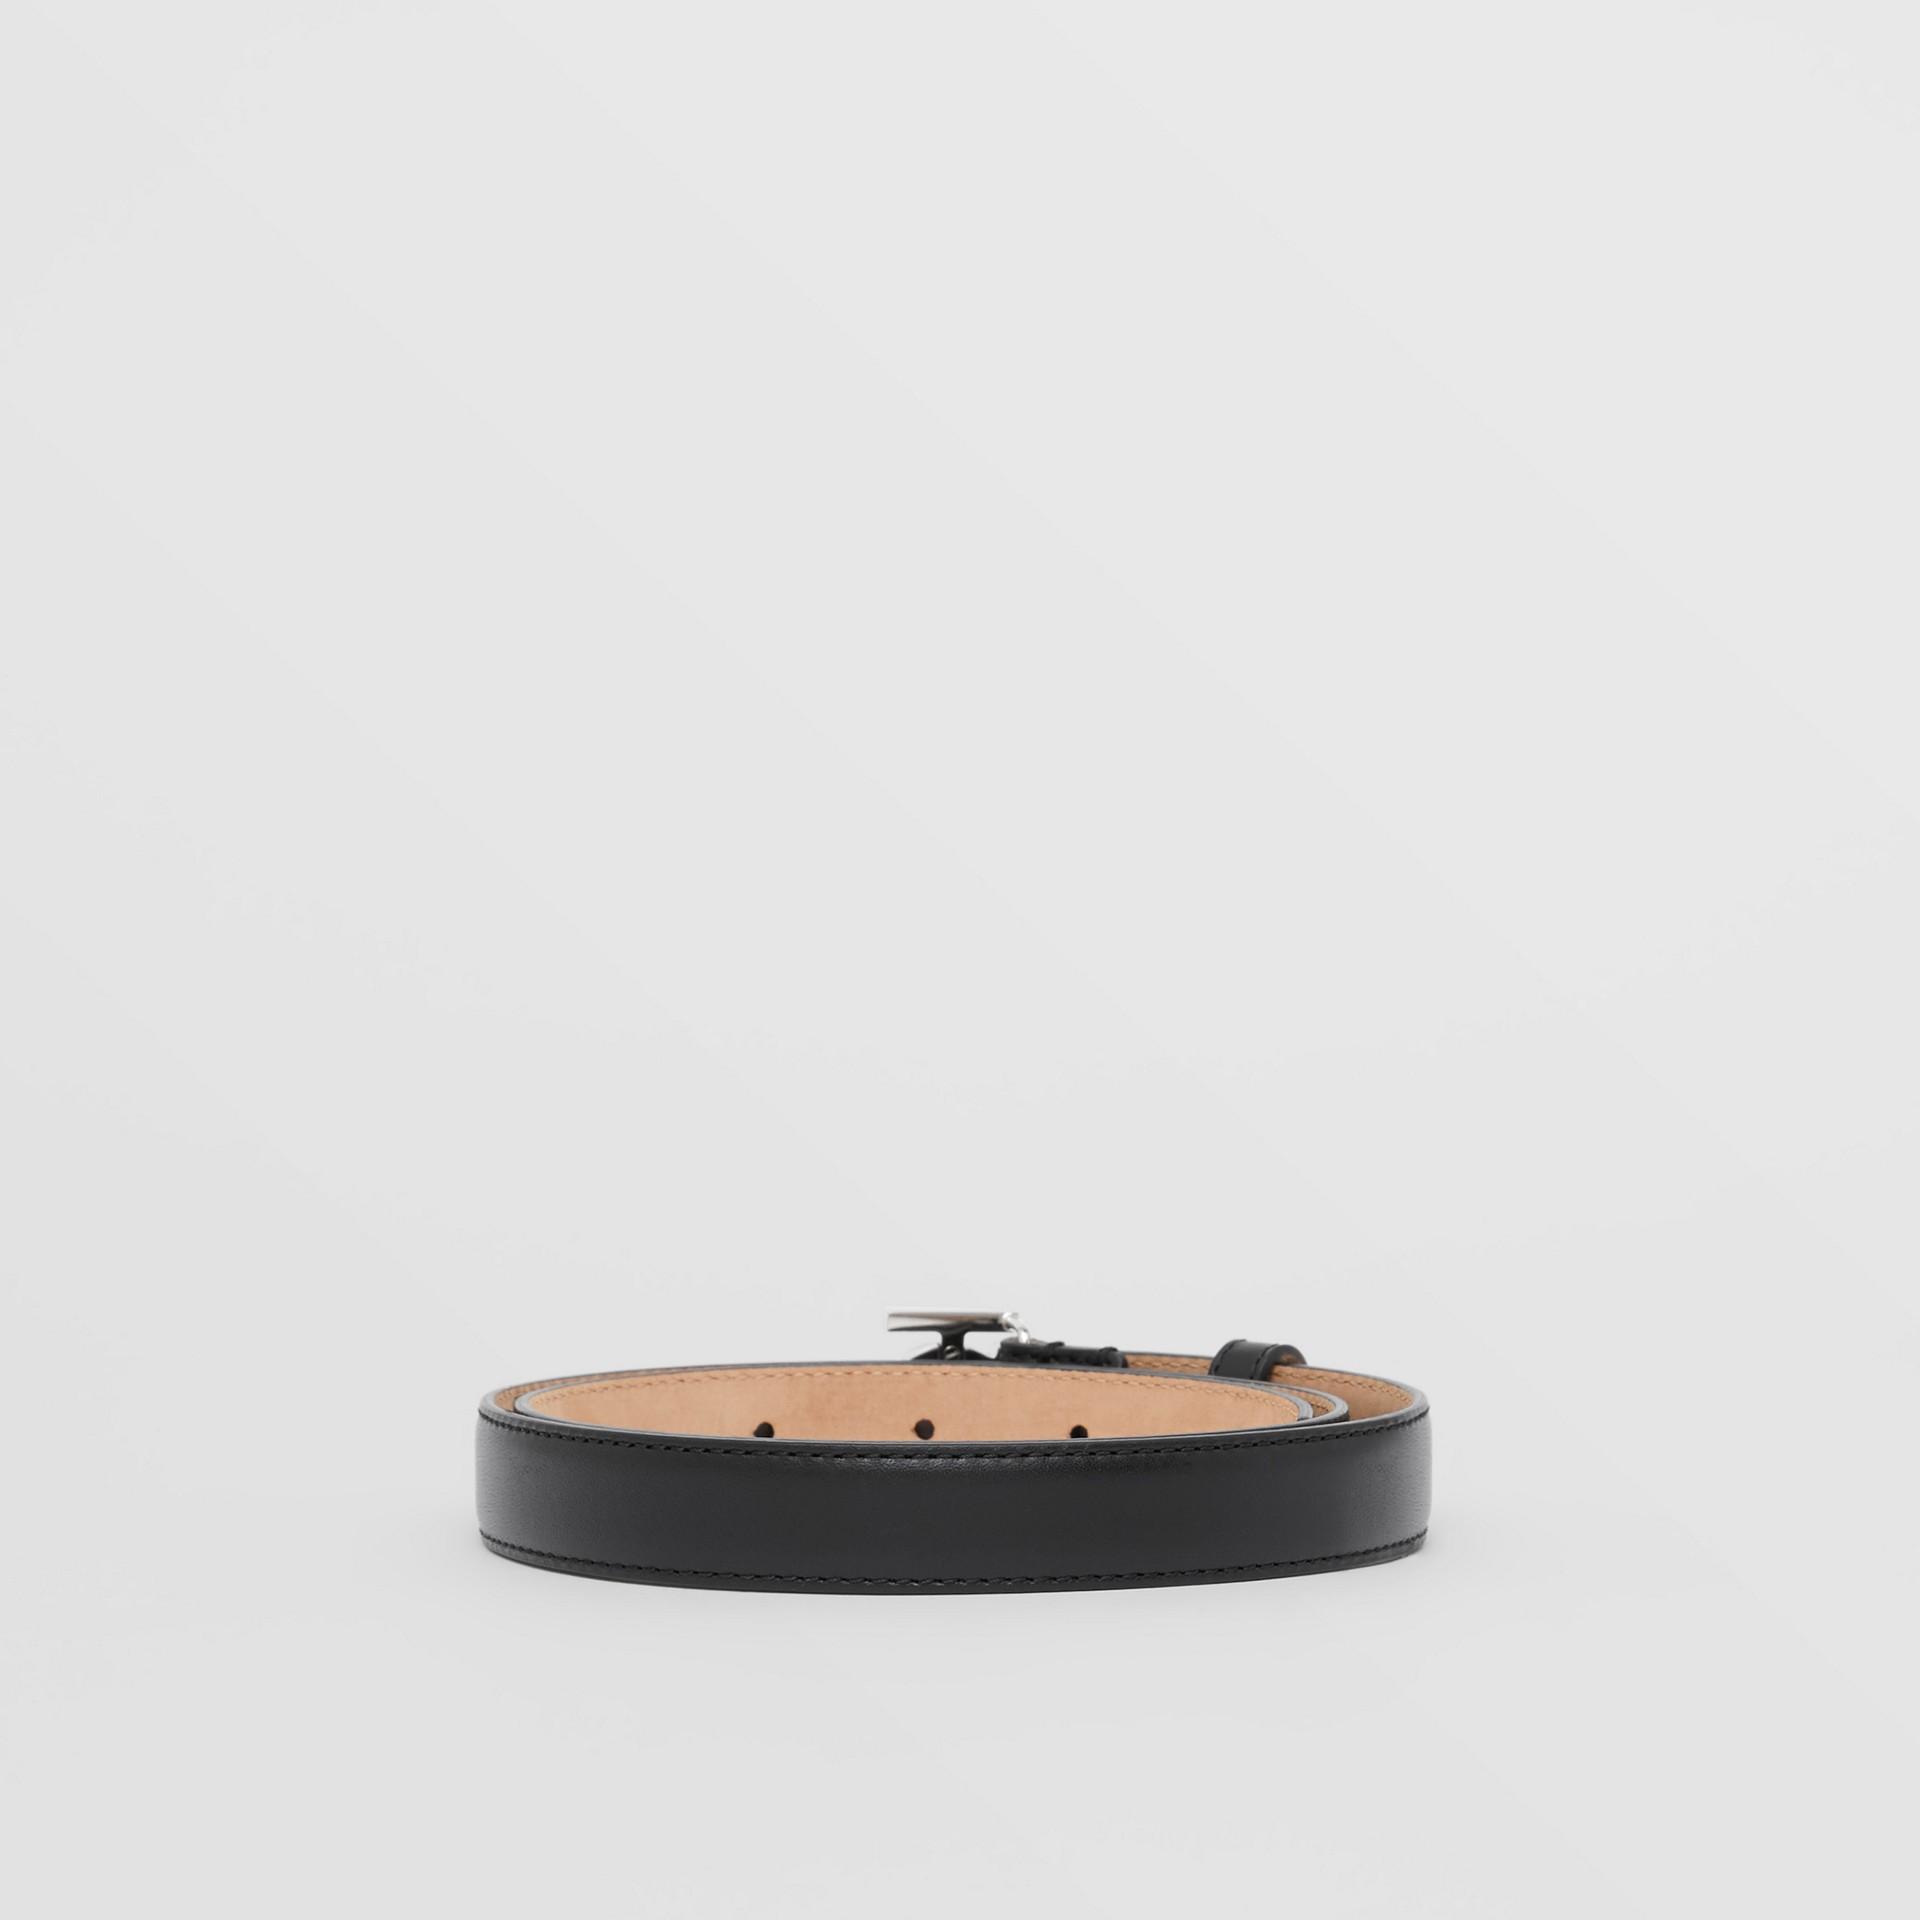 Monogram Motif Leather Belt in Black/palladio - Women | Burberry Canada - gallery image 4